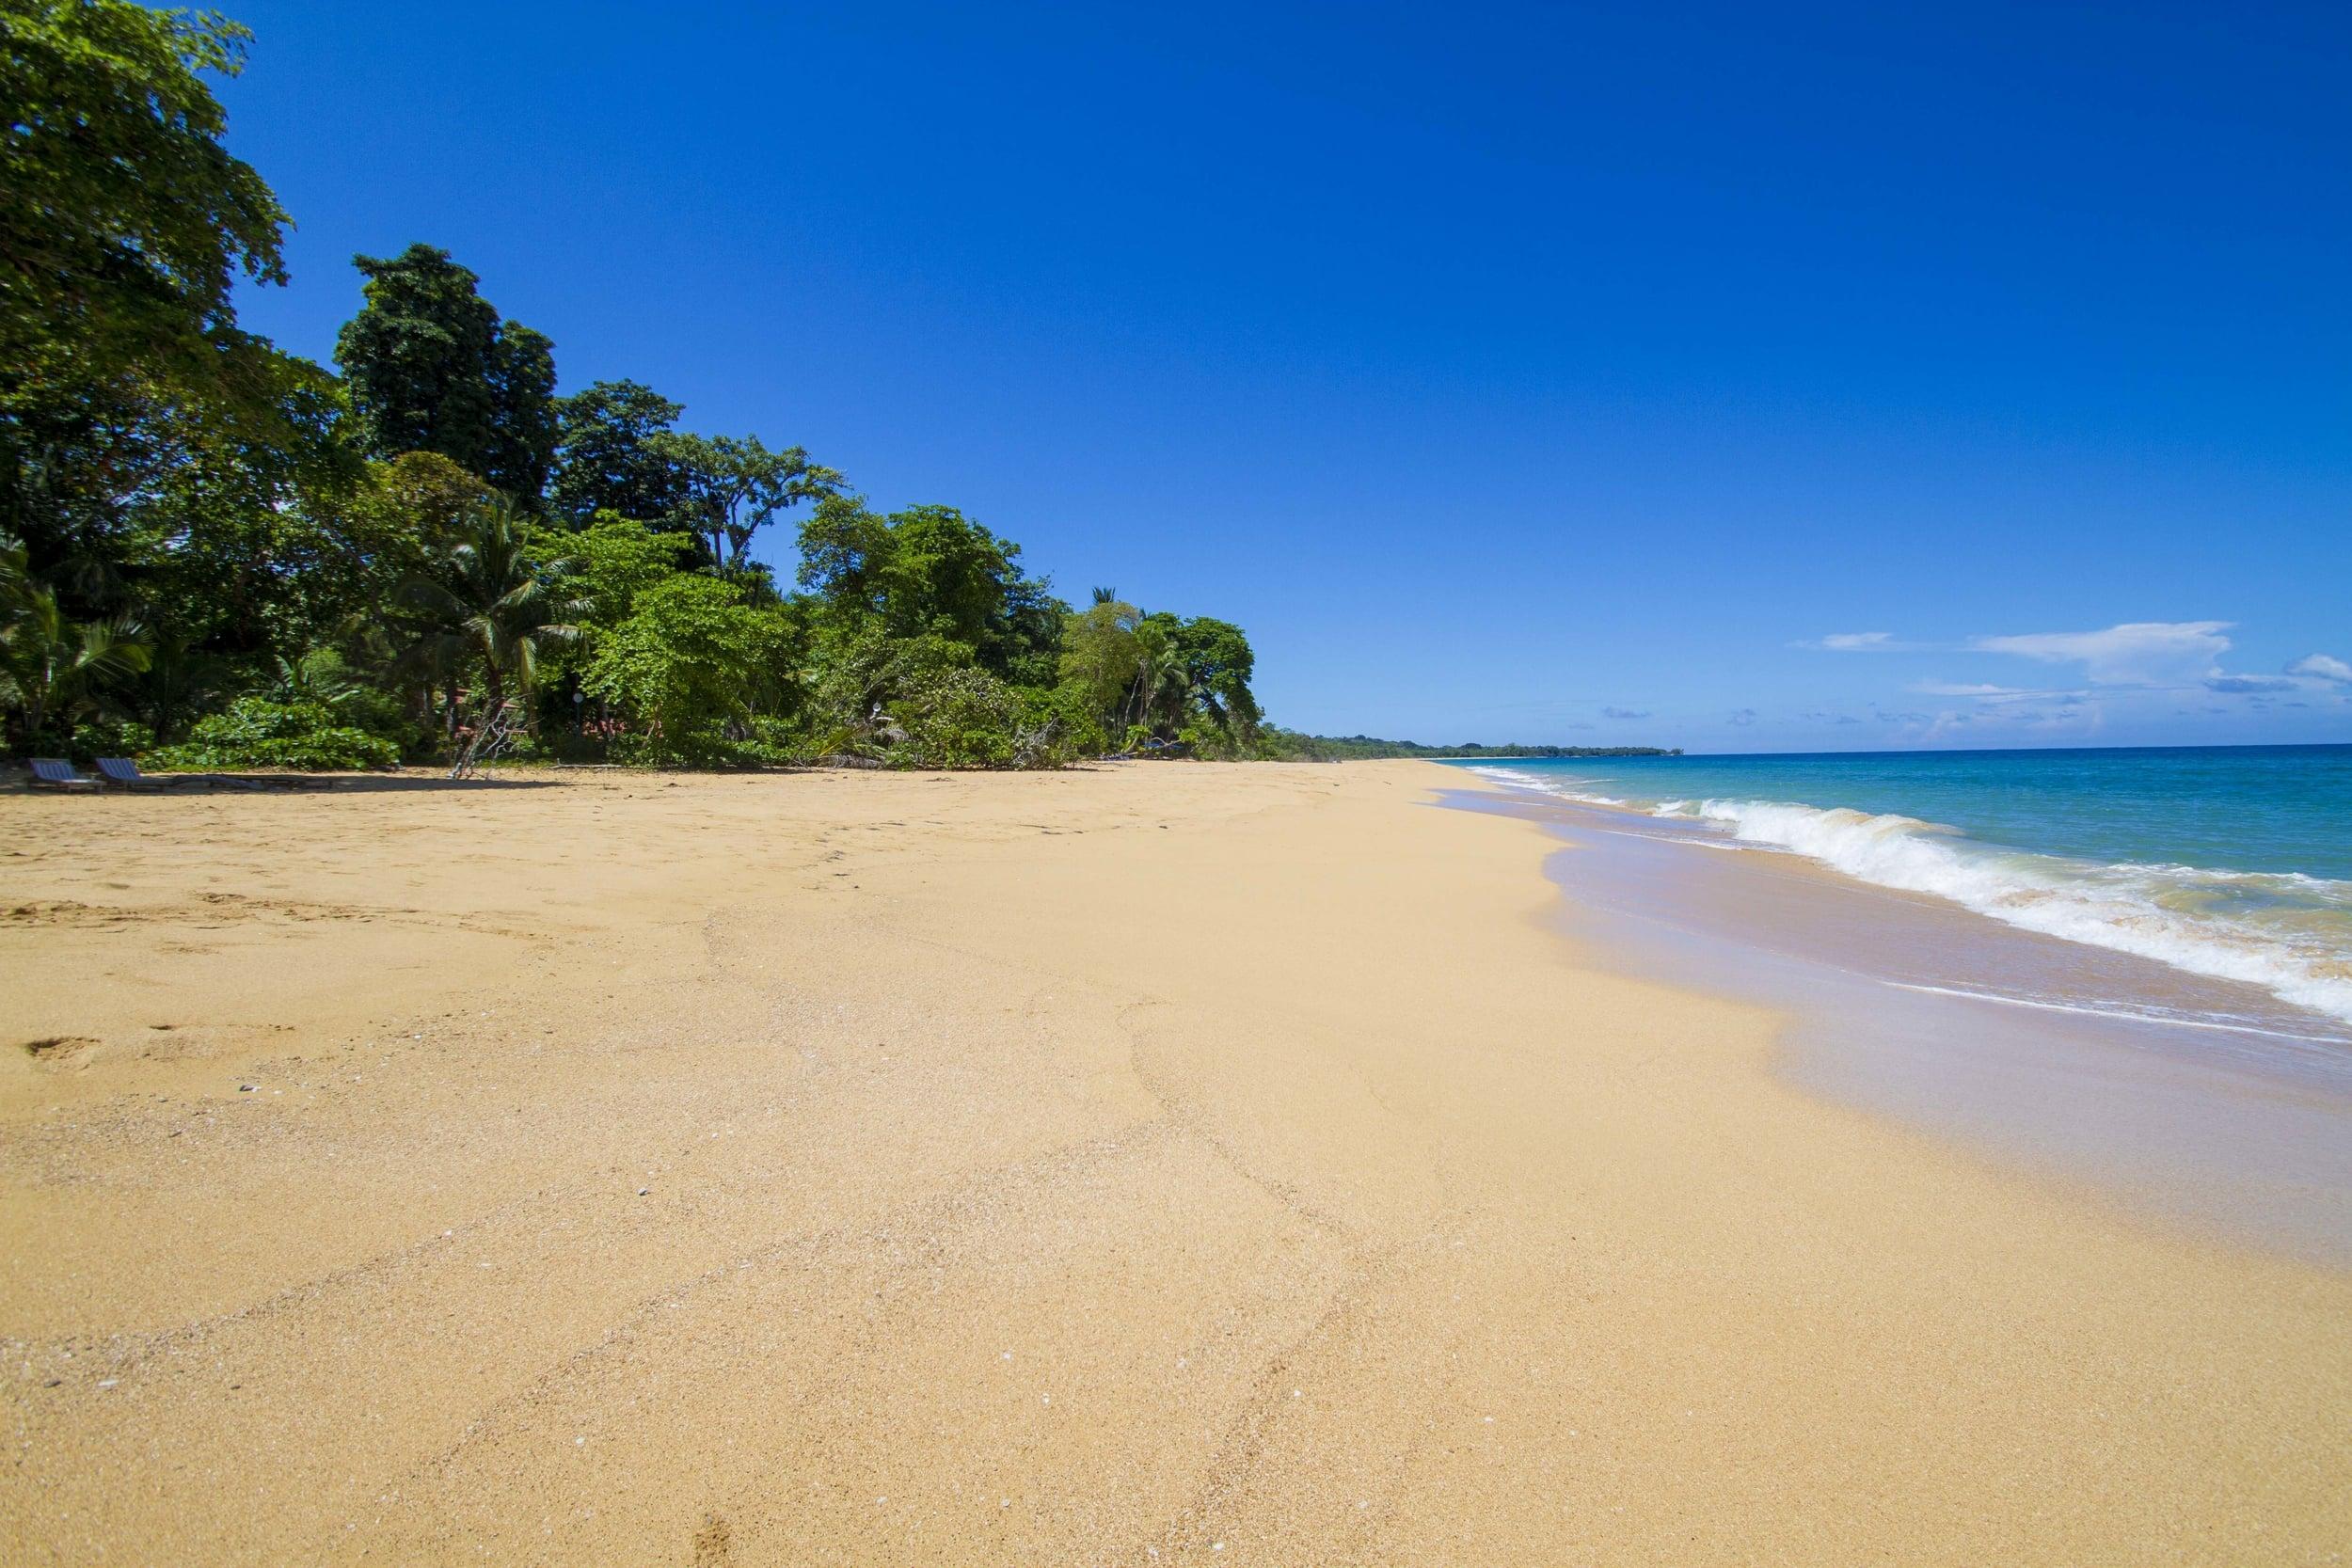 Photo by Luke Scherba. Playa Bluff, Bocas del Toro, Panama